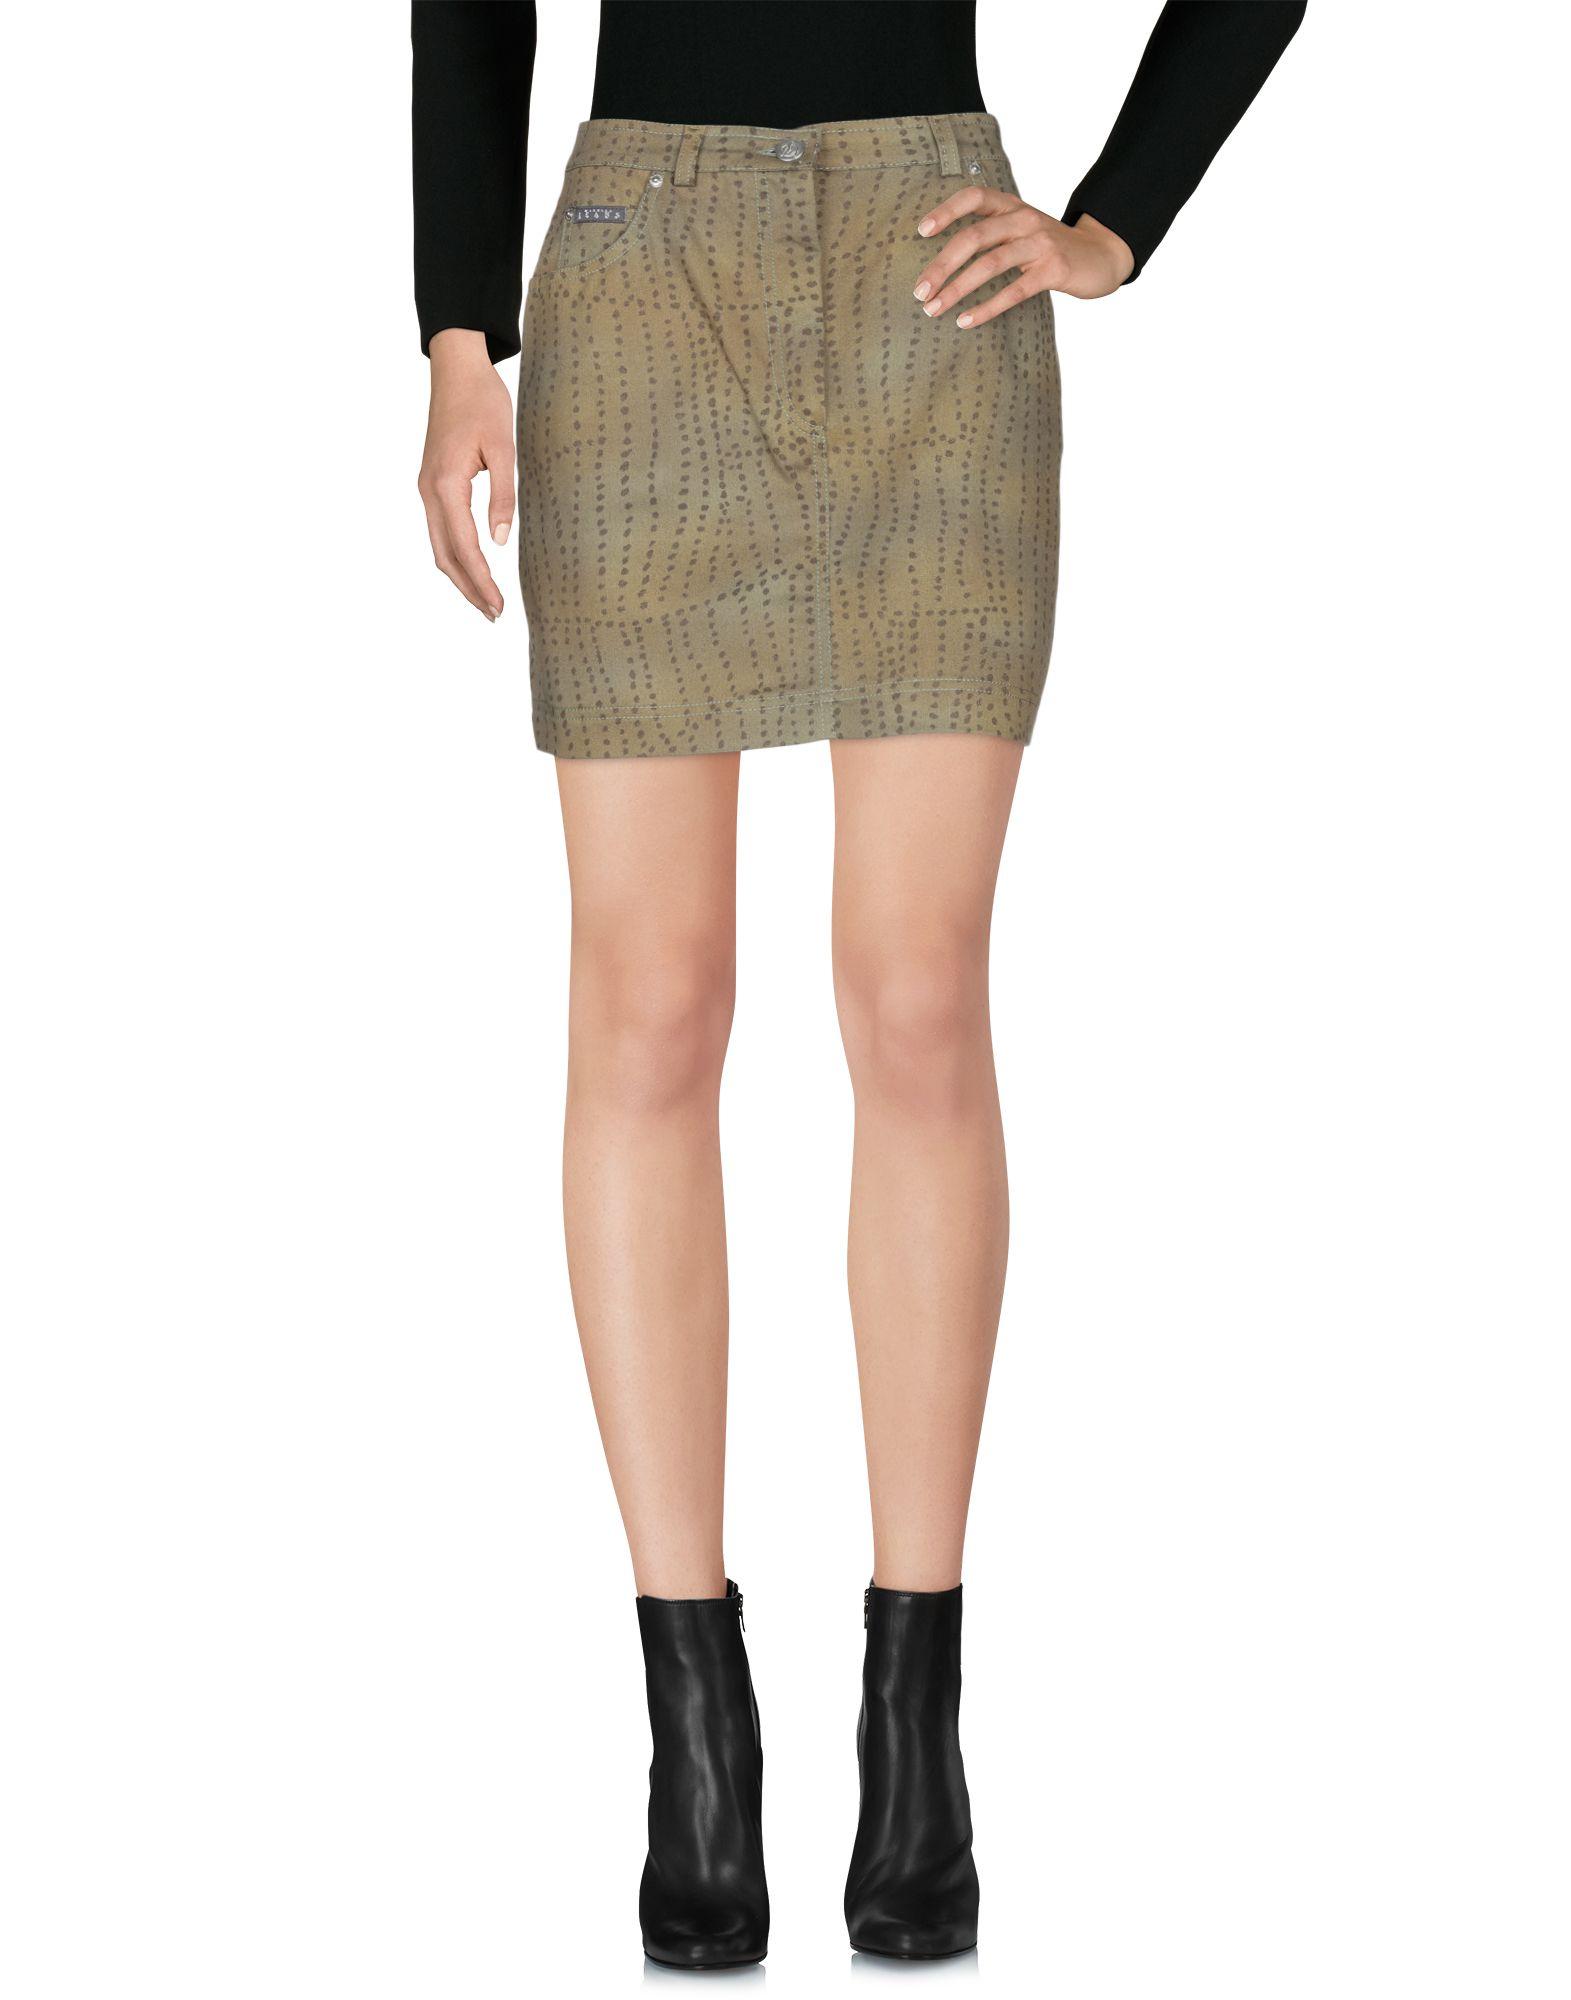 MARELLA SPORT Мини-юбка sport dress katrus платья и сарафаны мини короткие